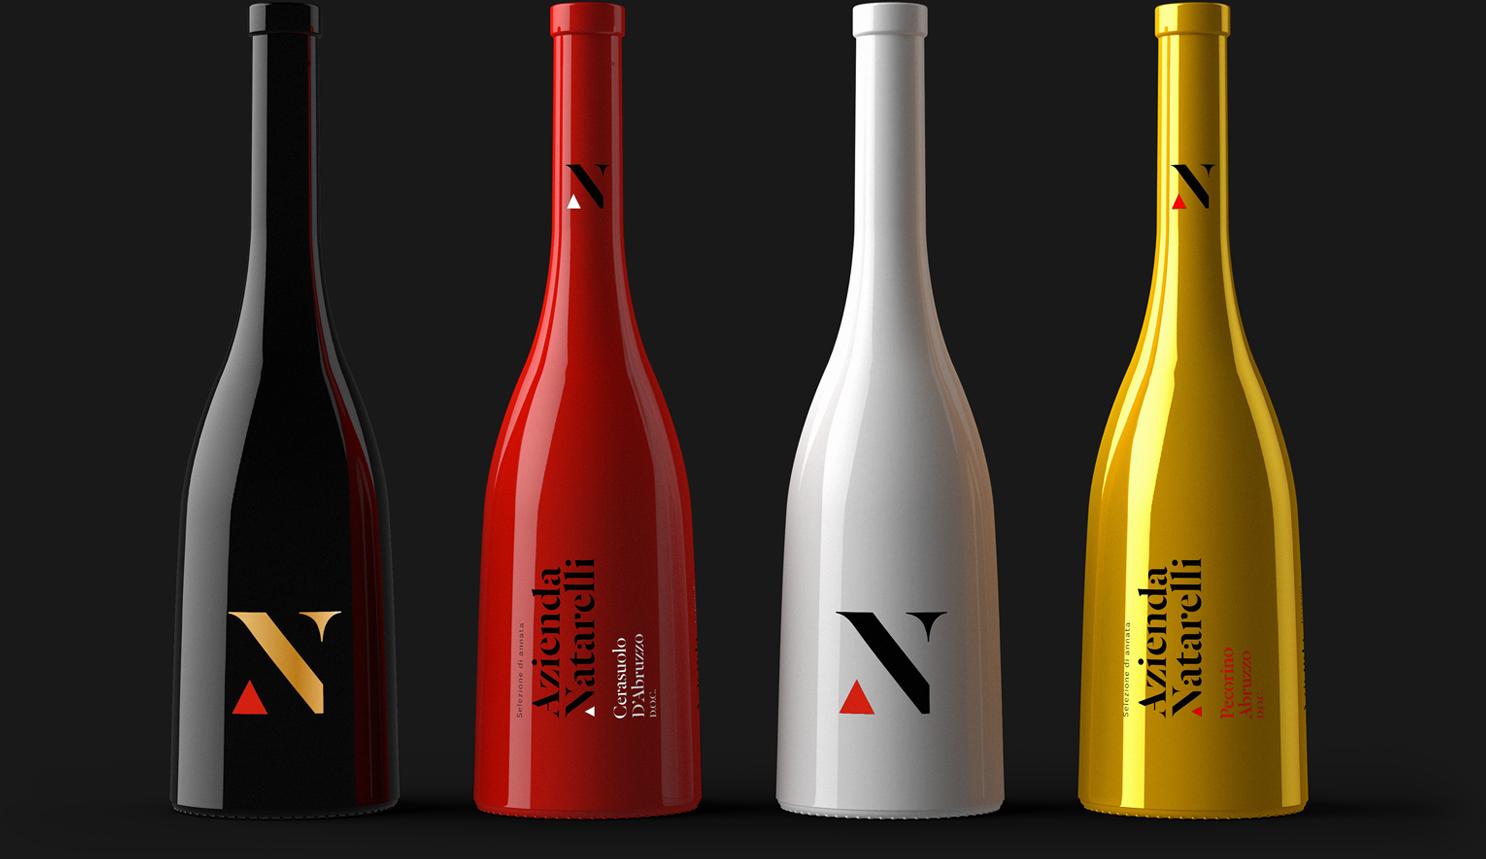 Azienda Natarelli Diseño Packaging Vino Italiano Tinto y Blanco